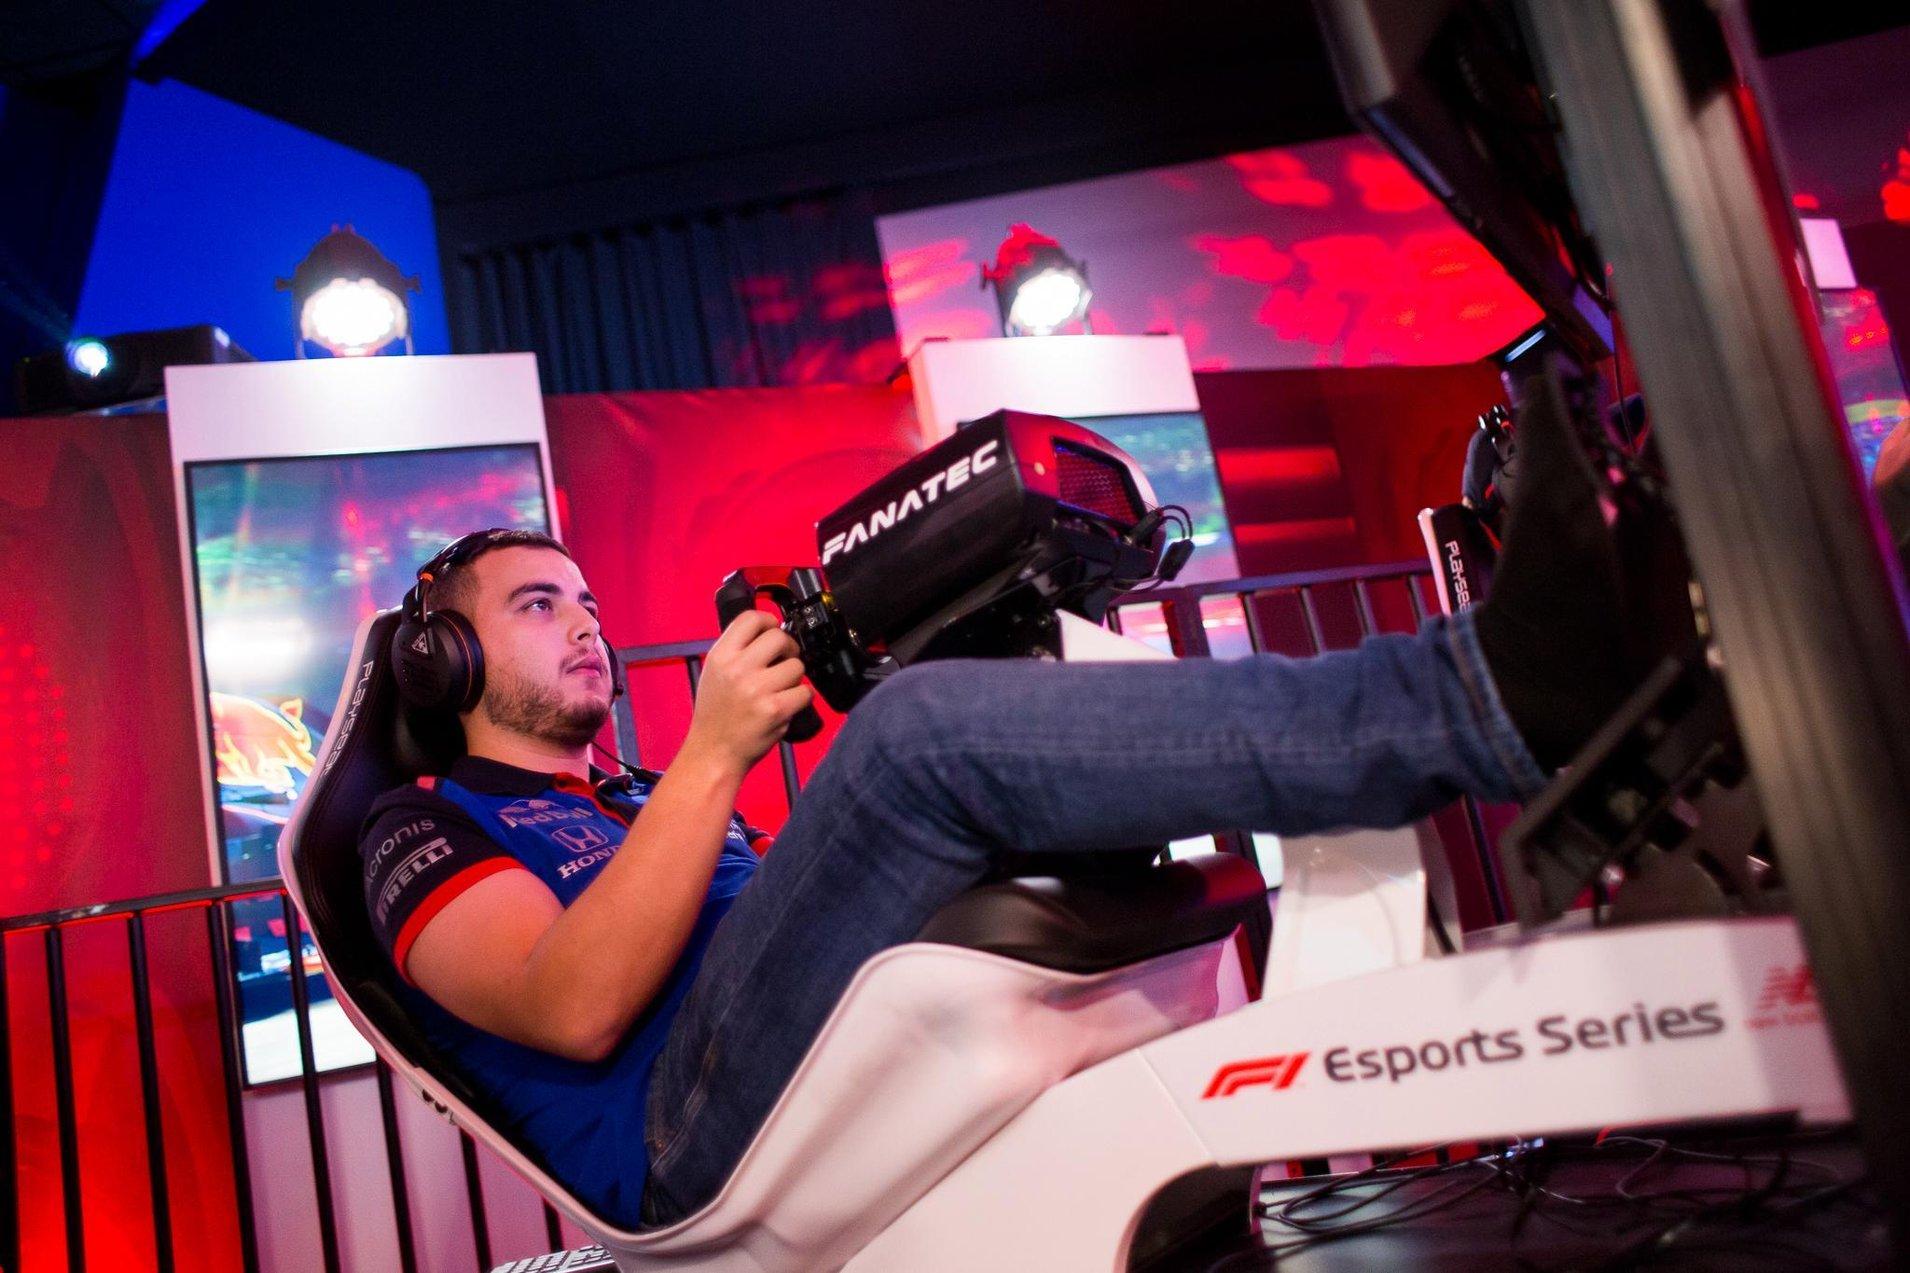 F1 Esport Series Grand Final – Gallery 10